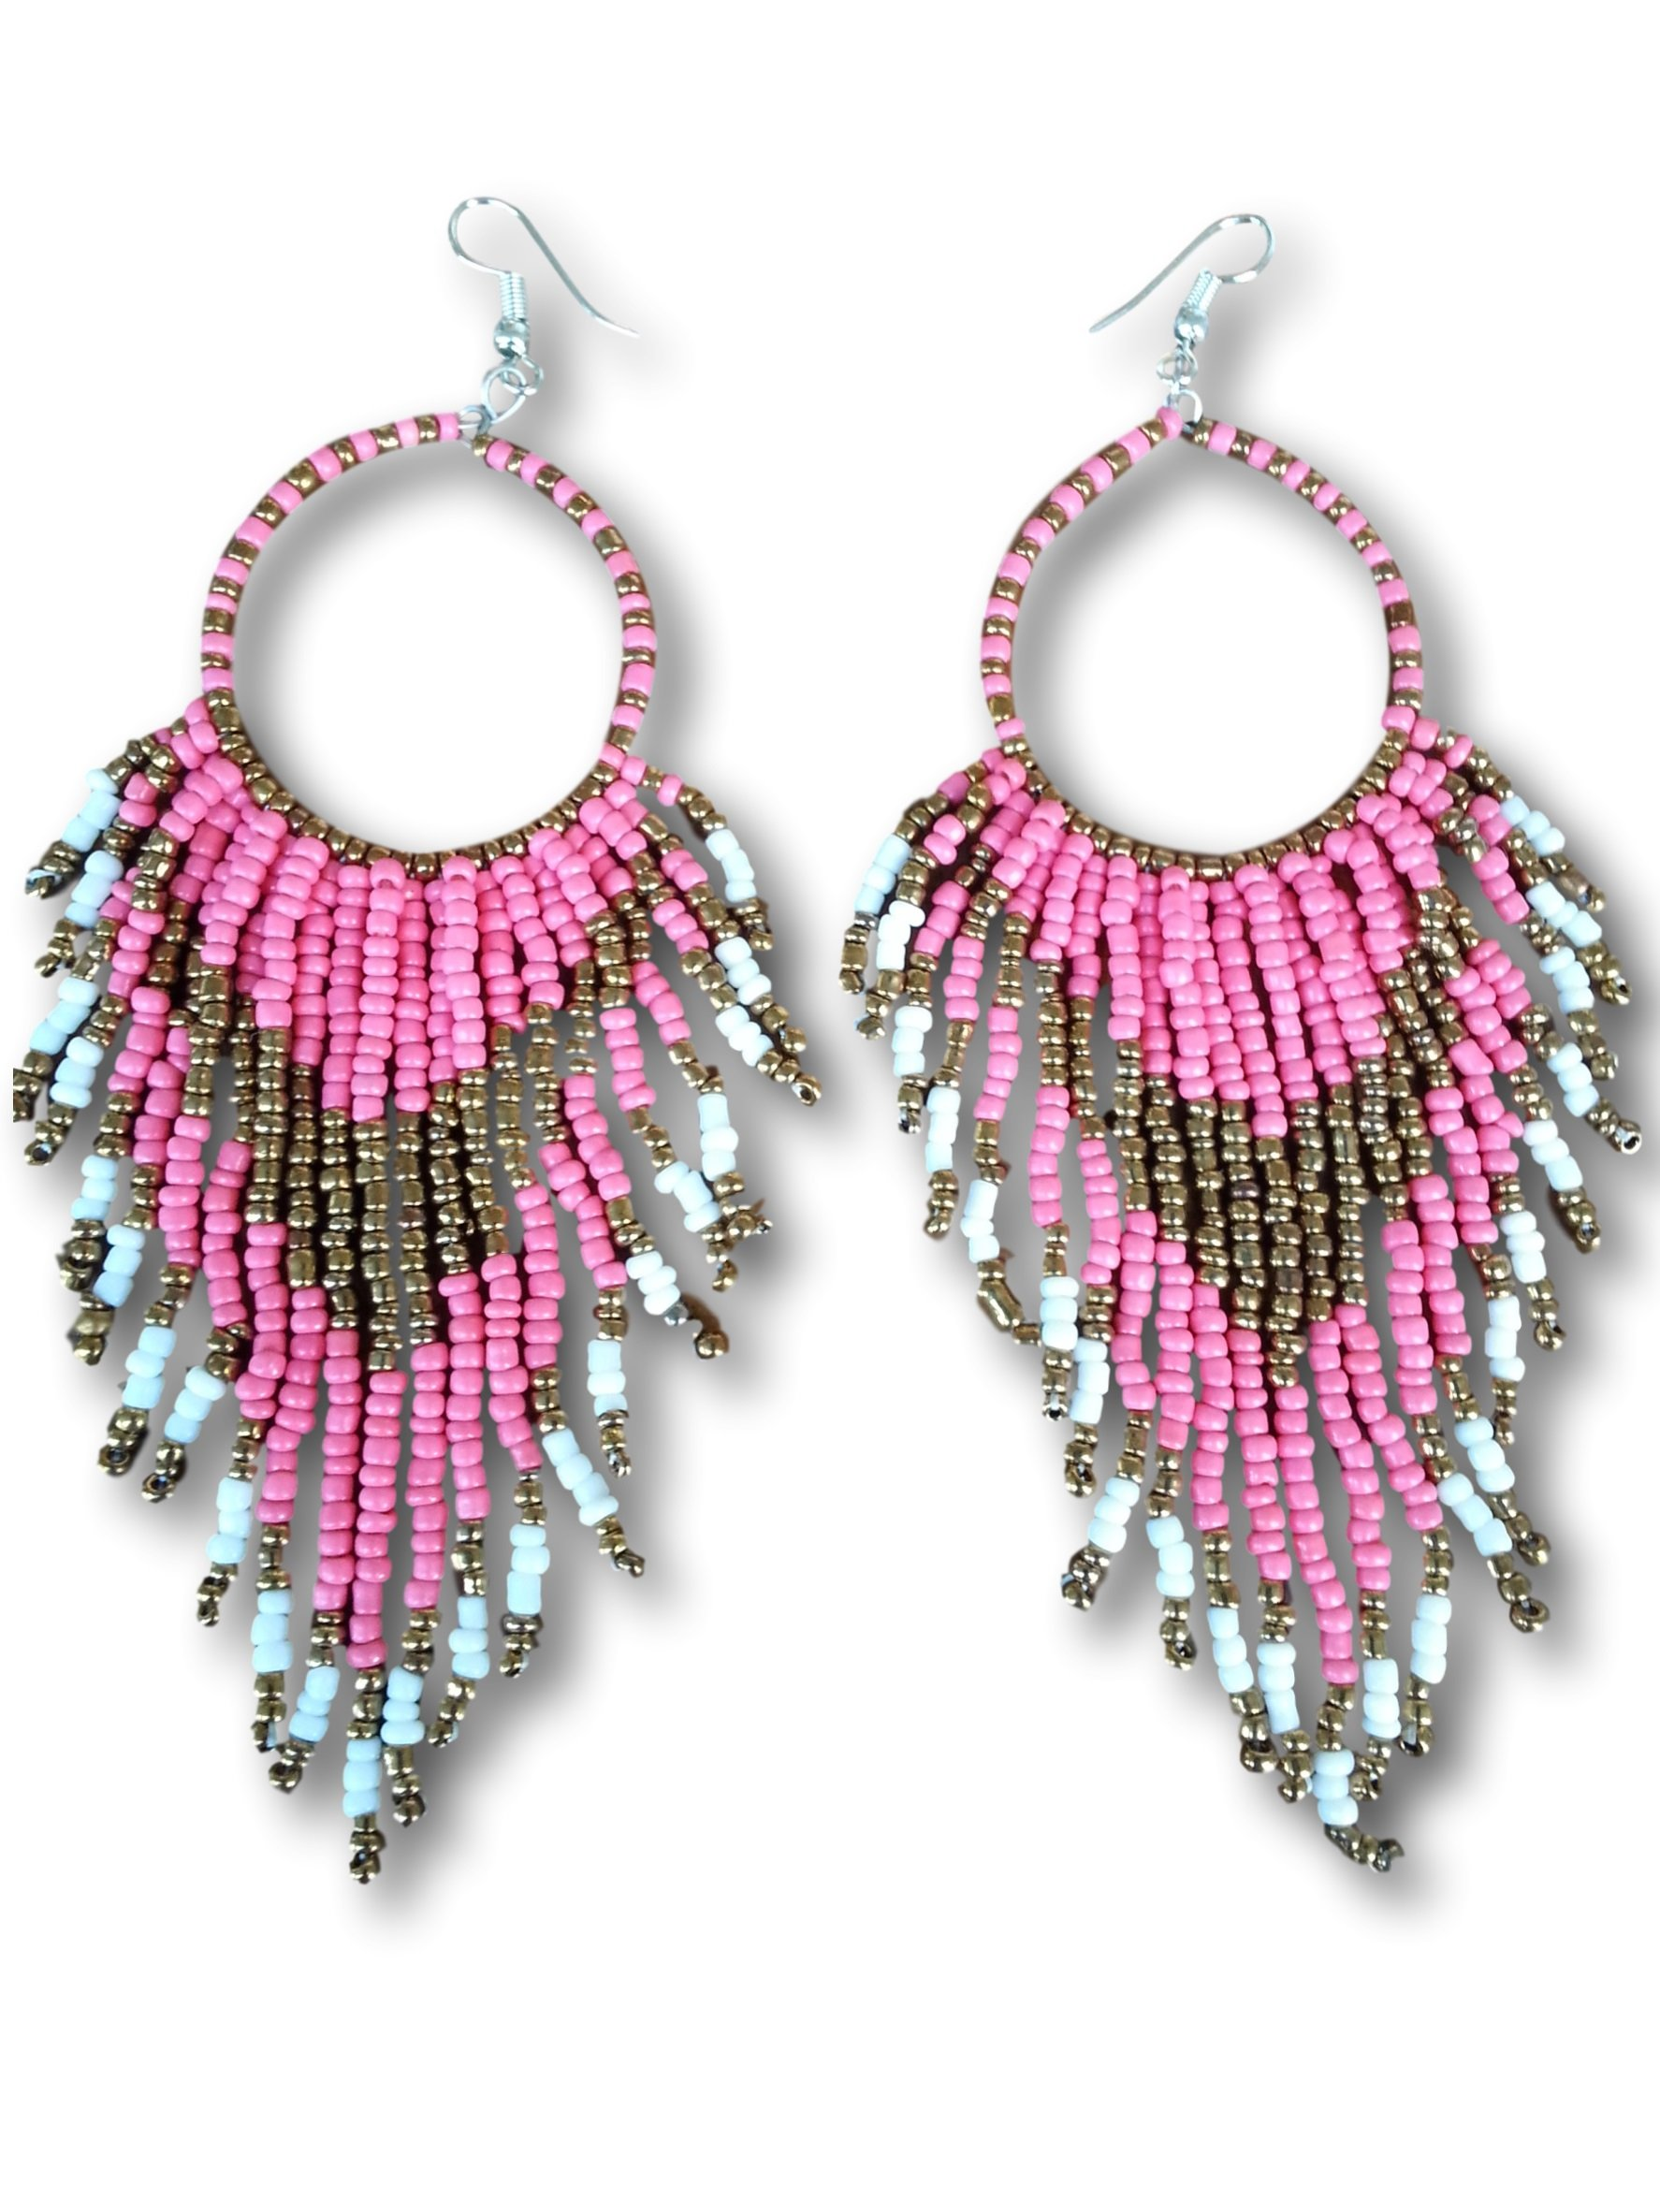 Tribal Dangle Fringe Tassel Bead & Hoop Earrings Native American Style by Pashal (Soft Pink)